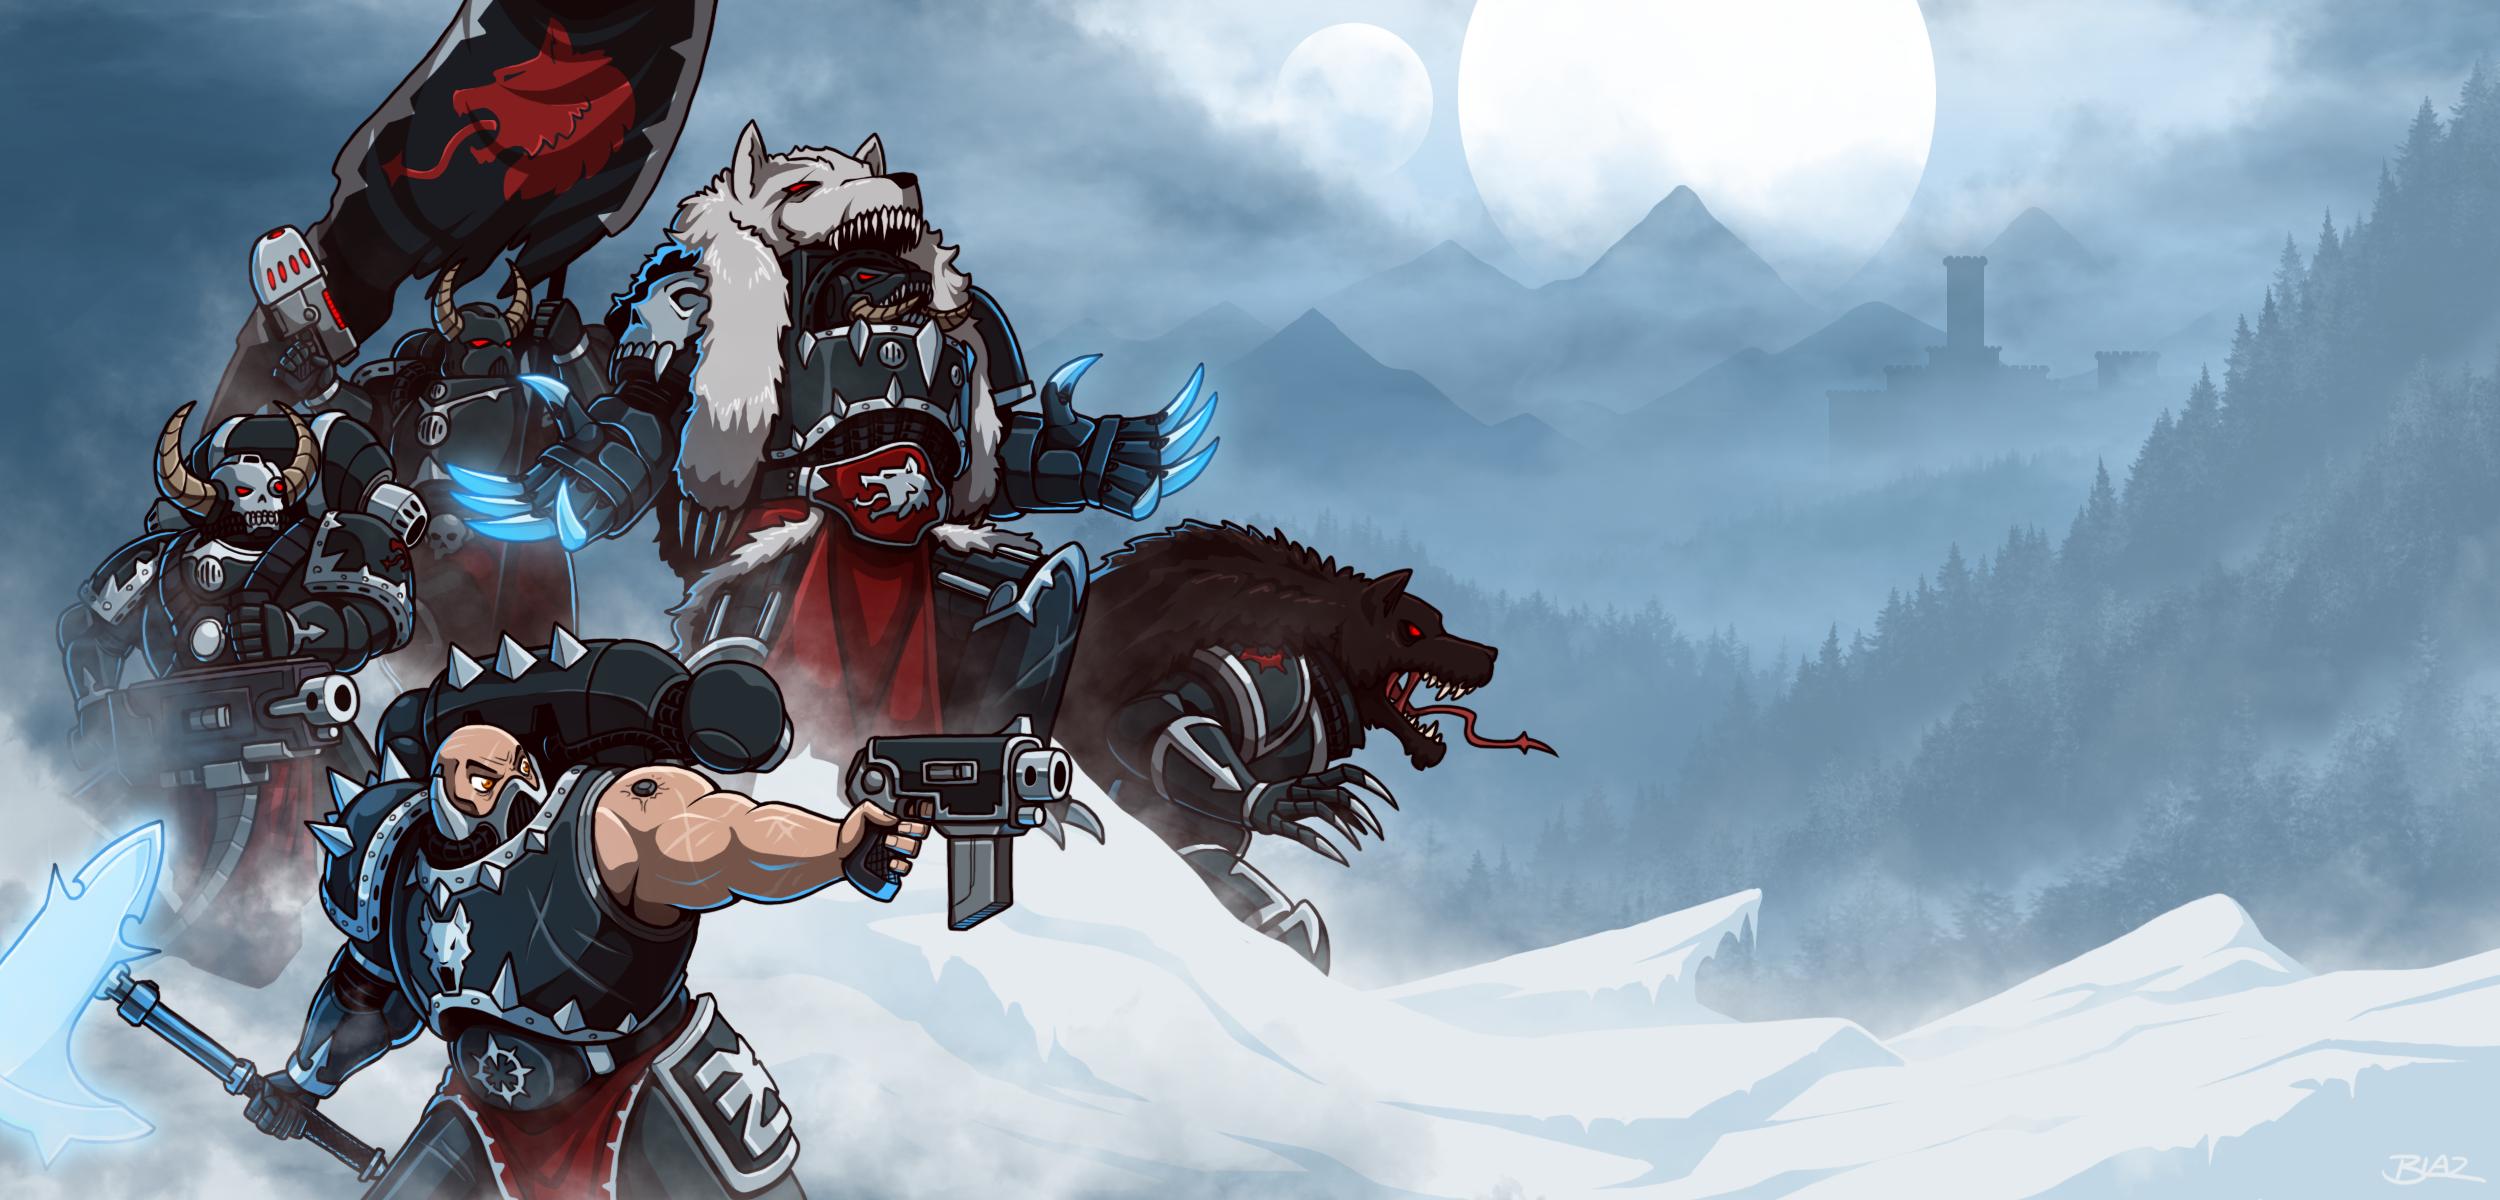 Skyrar's Dark Wolves by Blazbaros